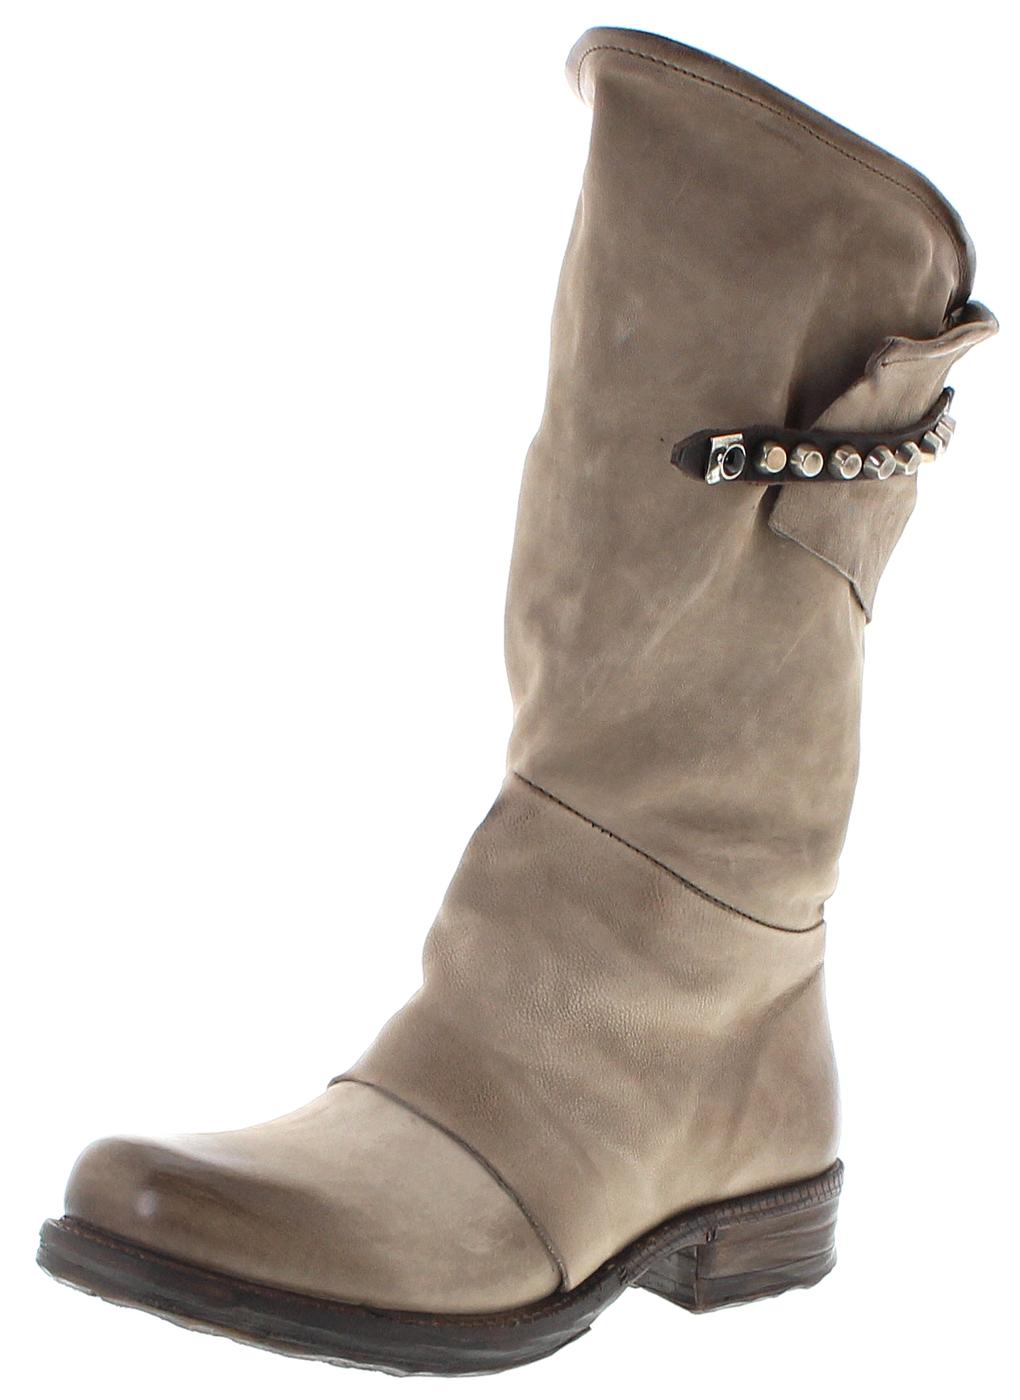 A.S.98 520383 Cartone Fashion Stiefel - grau